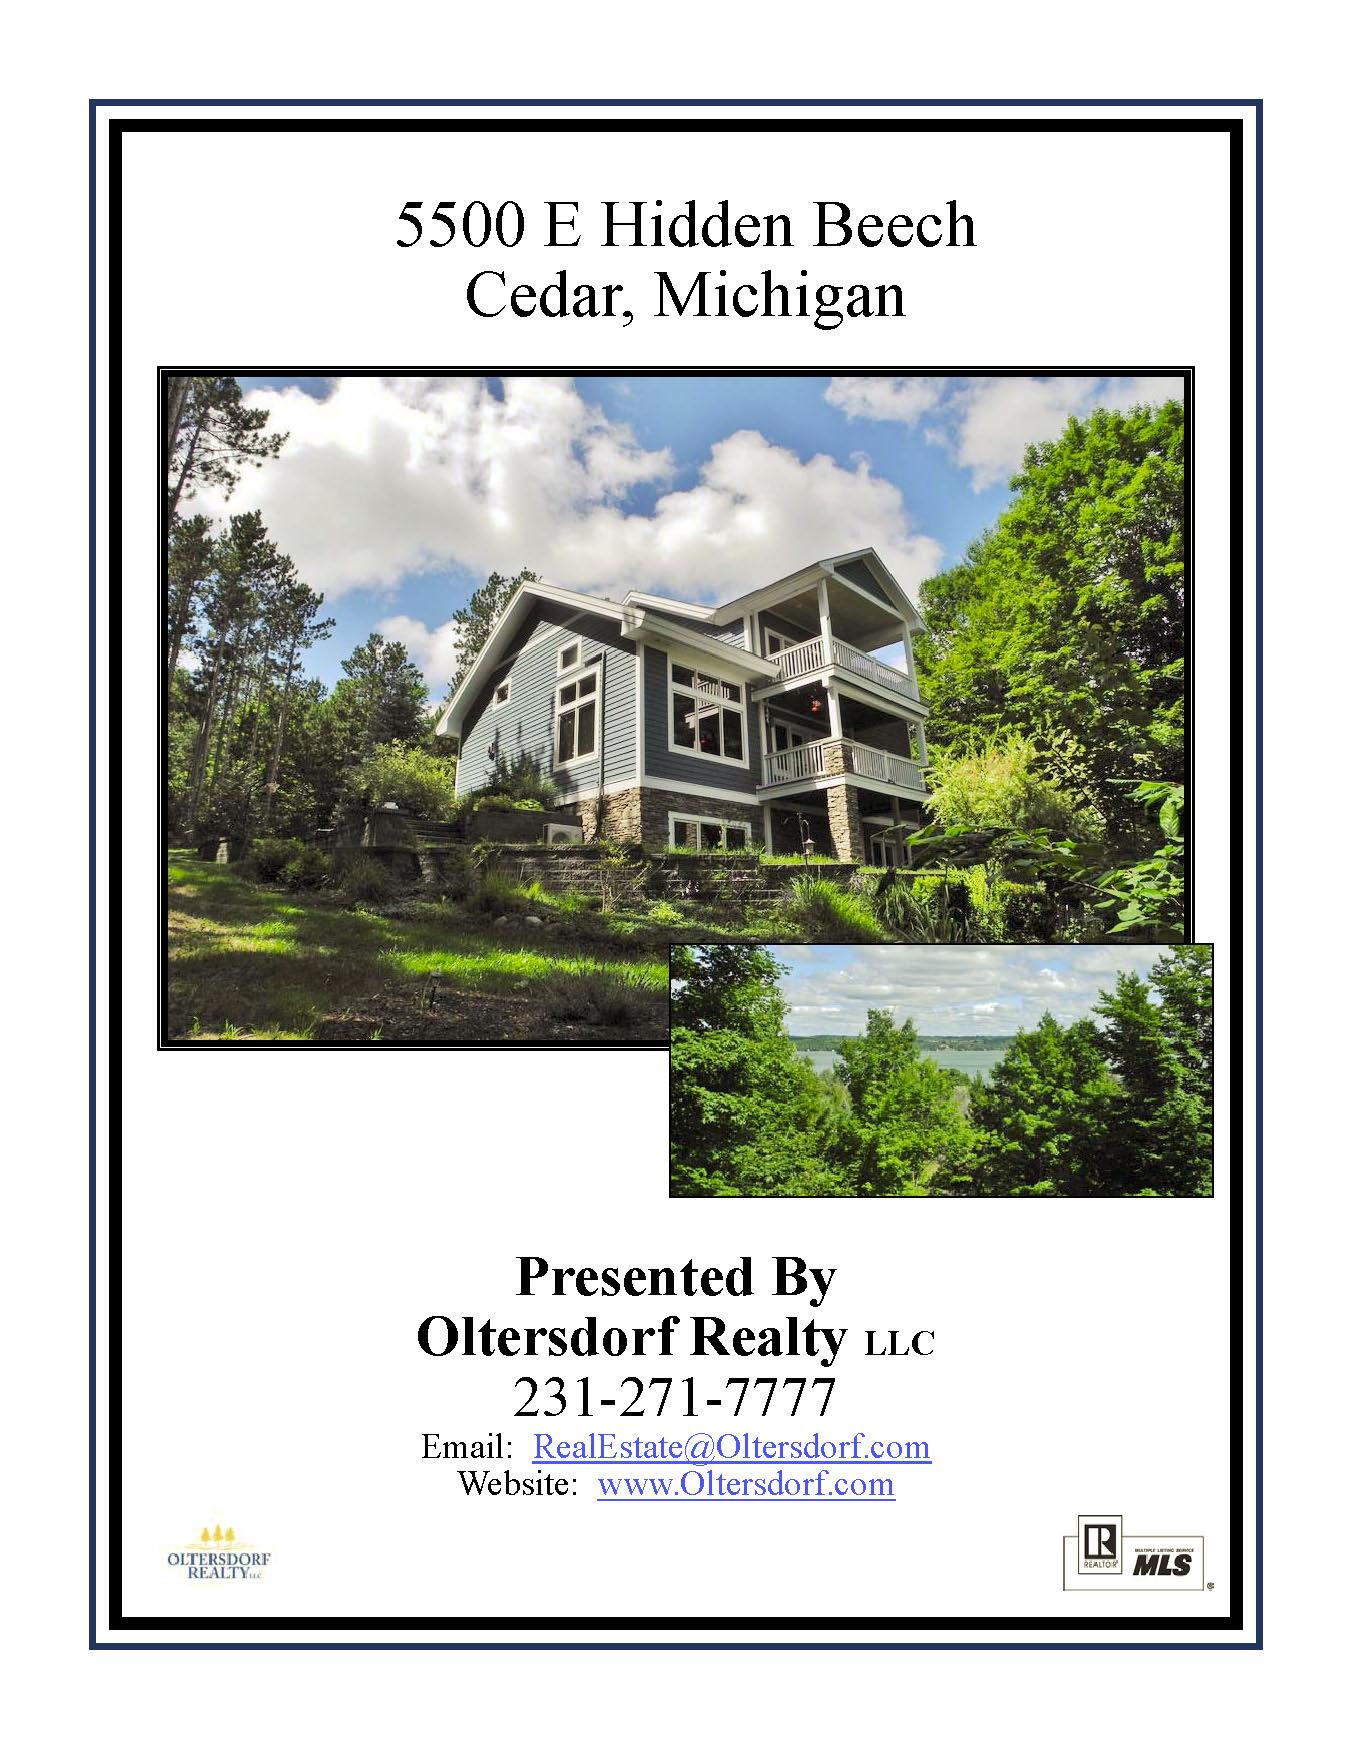 5500 E Hidden Beech, Cedar, MI - For sale by Oltersdorf Realty LLC - Marketing Packet (1).jpg